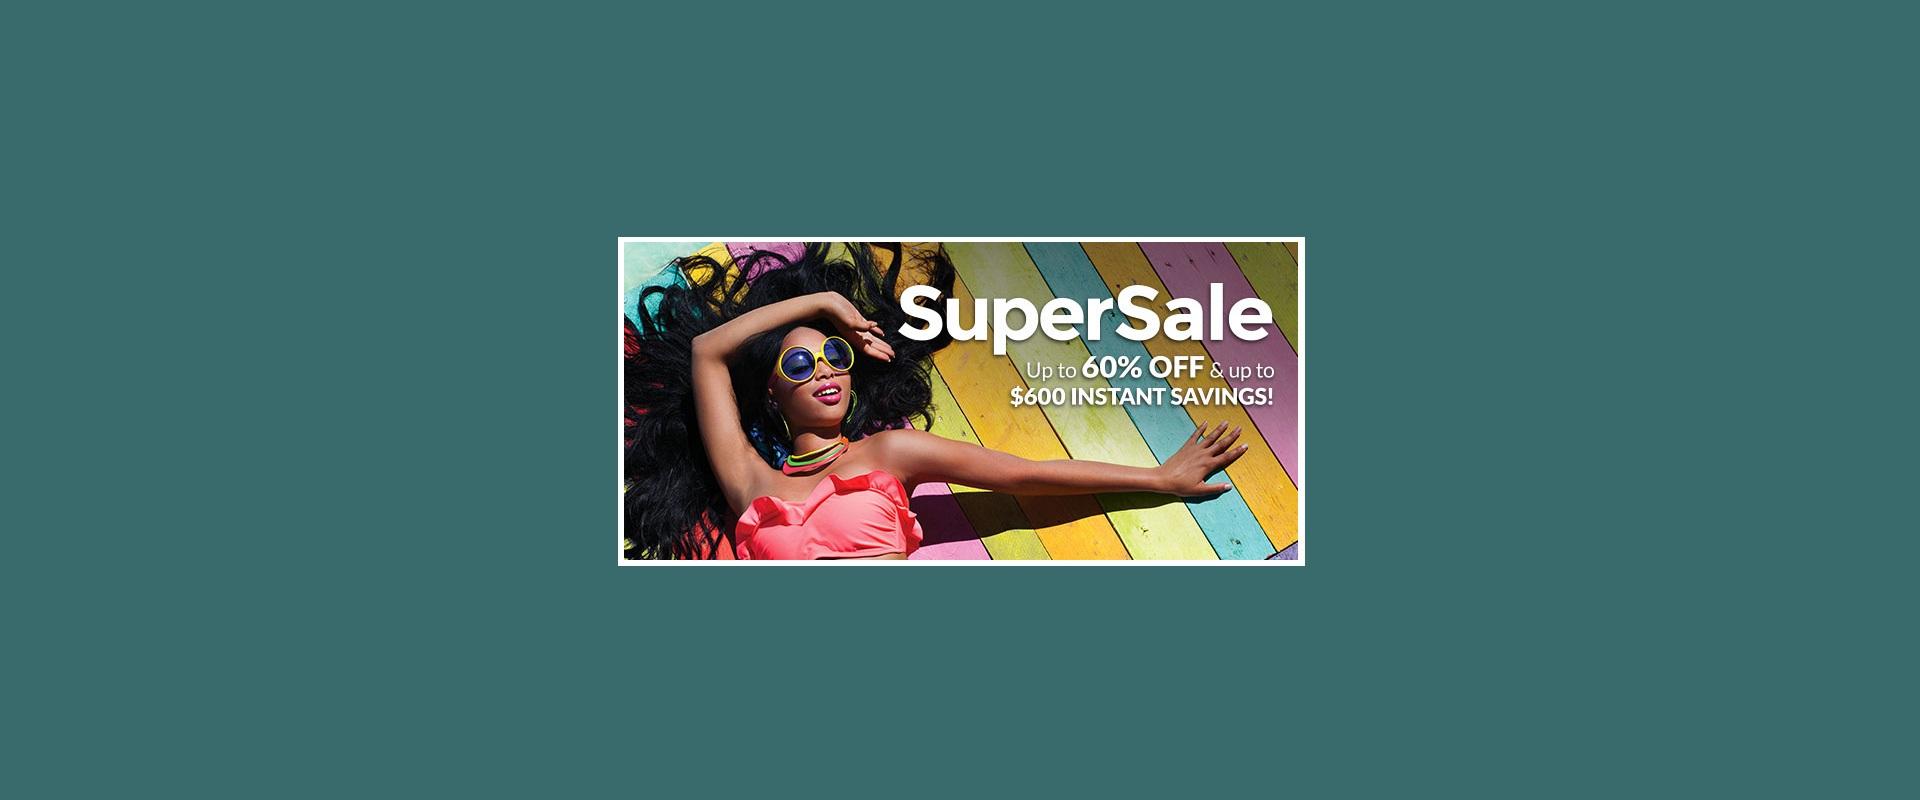 Super-Sale-Banner